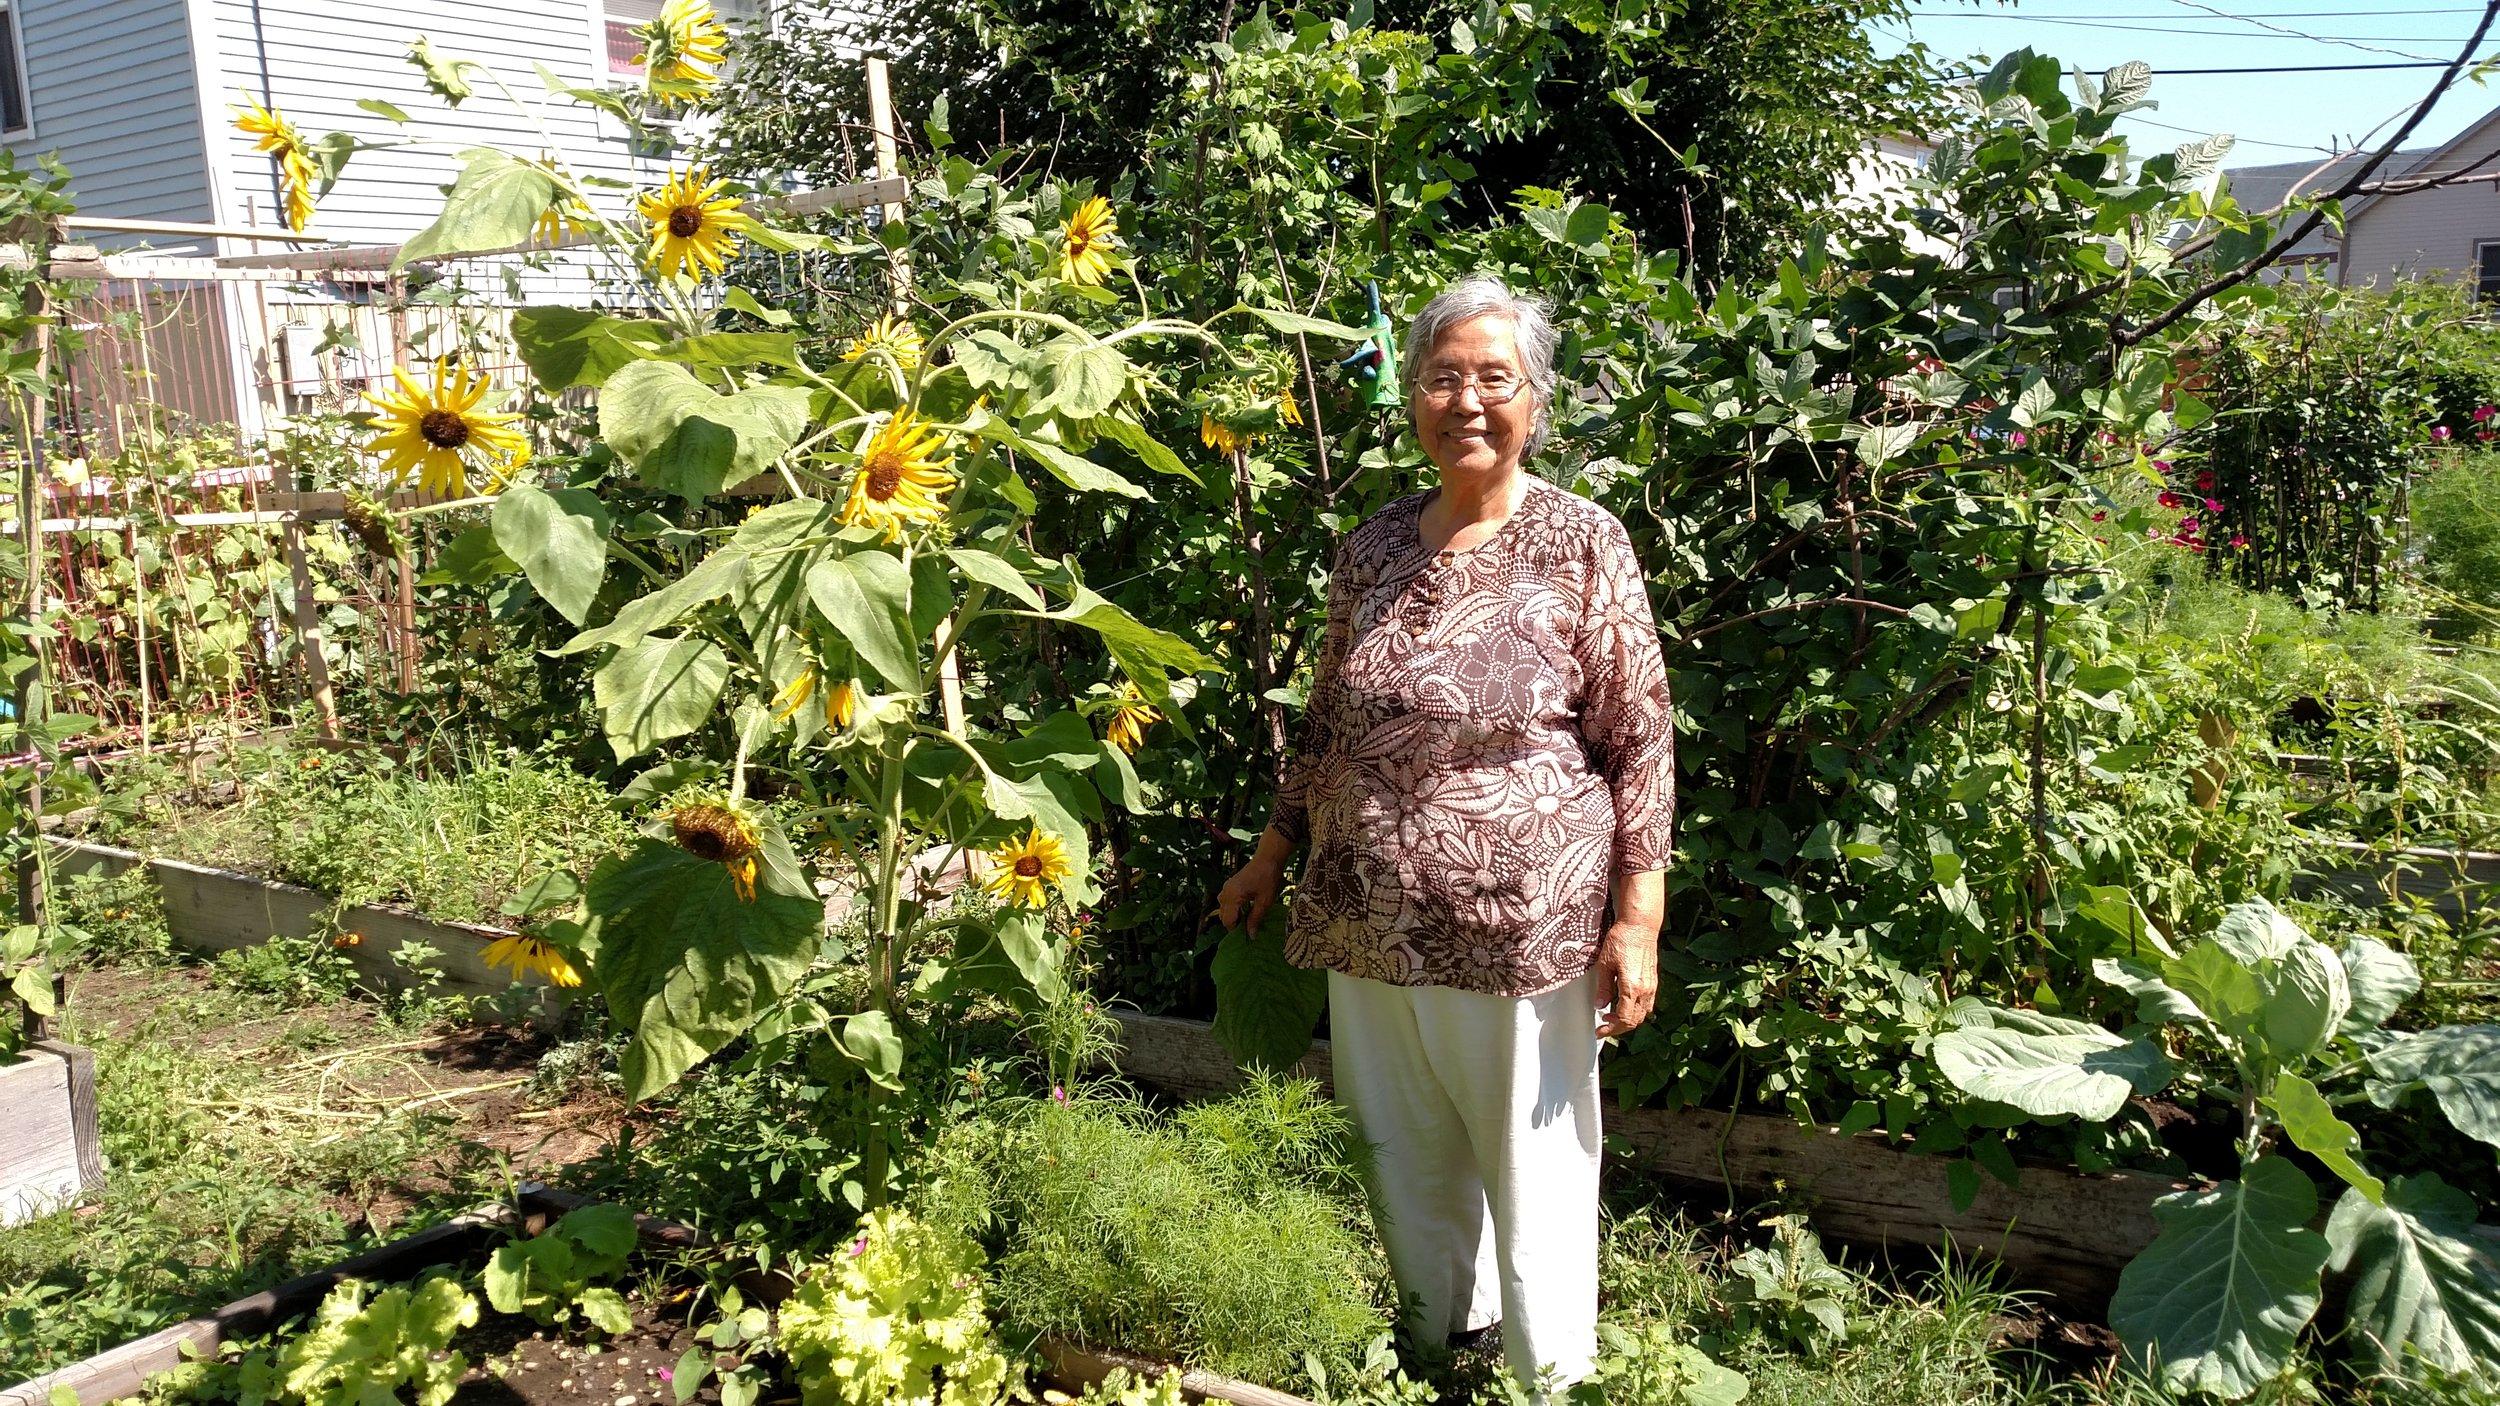 Gardens make good neighbors - and vice versa